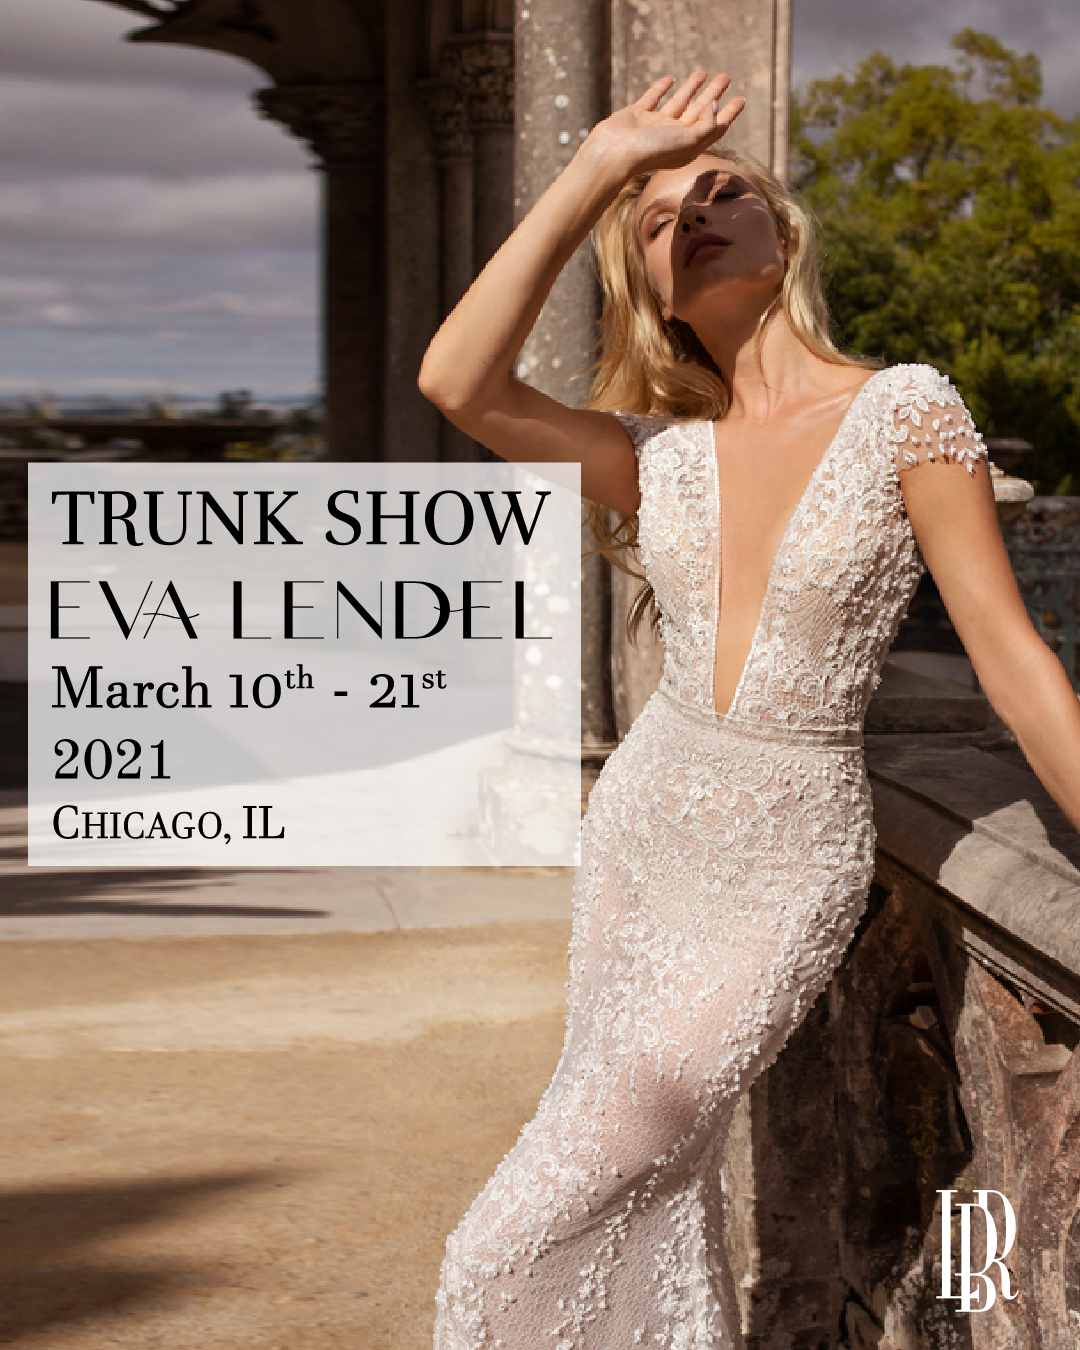 Eva Lendel trunk show